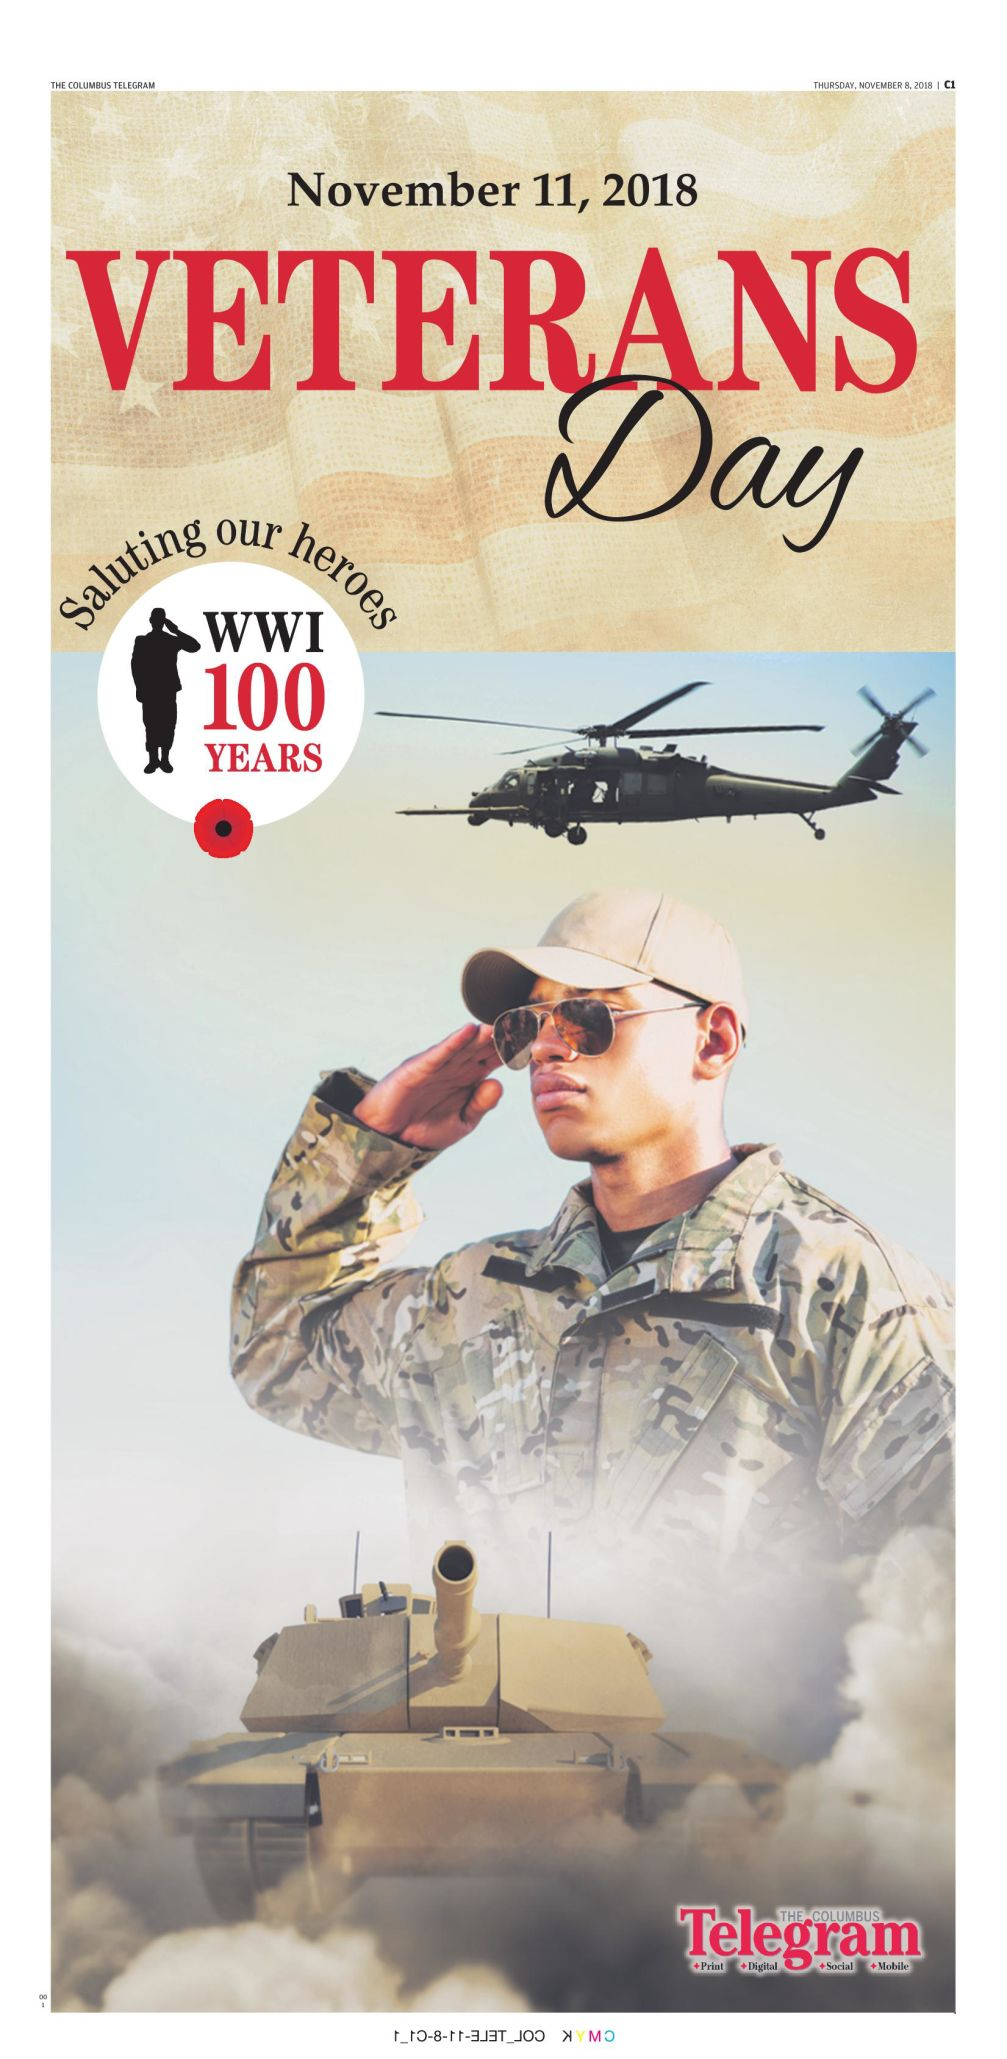 Veterans Day - 110818